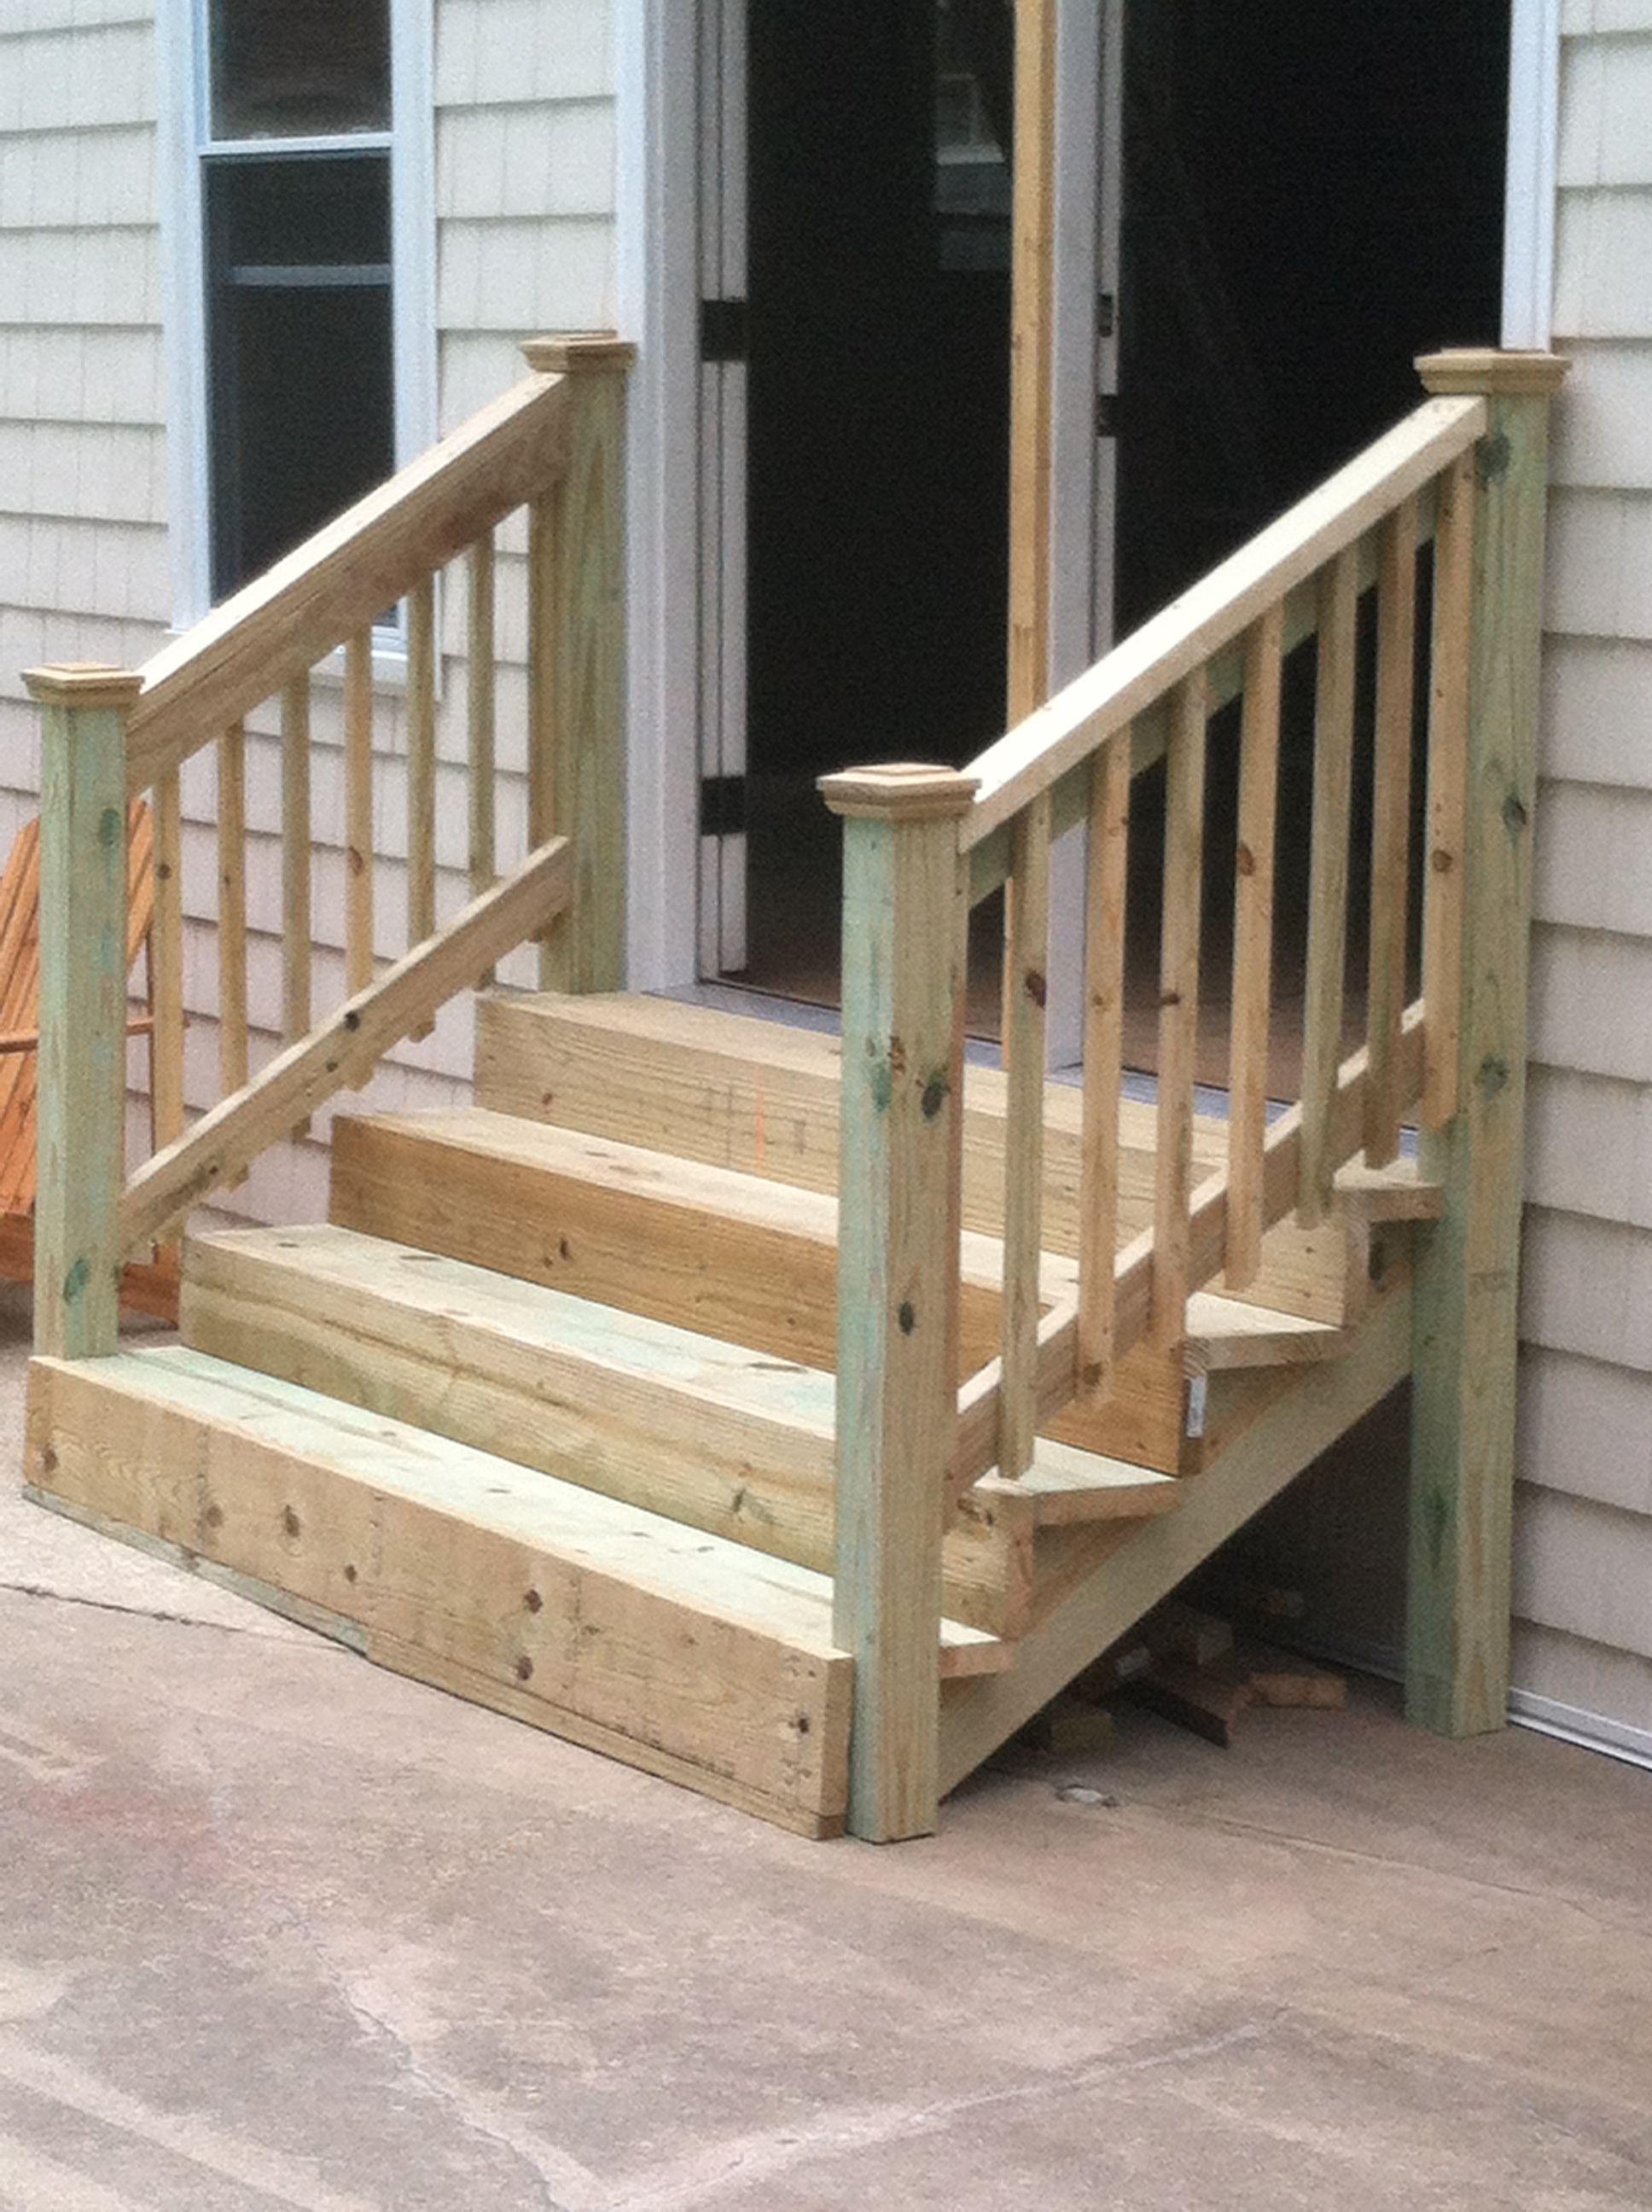 Sunroom Steps Patio Stairs Outdoor Stair Railing Outdoor Stairs | Outside Porch Step Railings | Wrought Iron Railings | Stair Stringers | Vinyl Railing | Concrete Steps | Railing Ideas